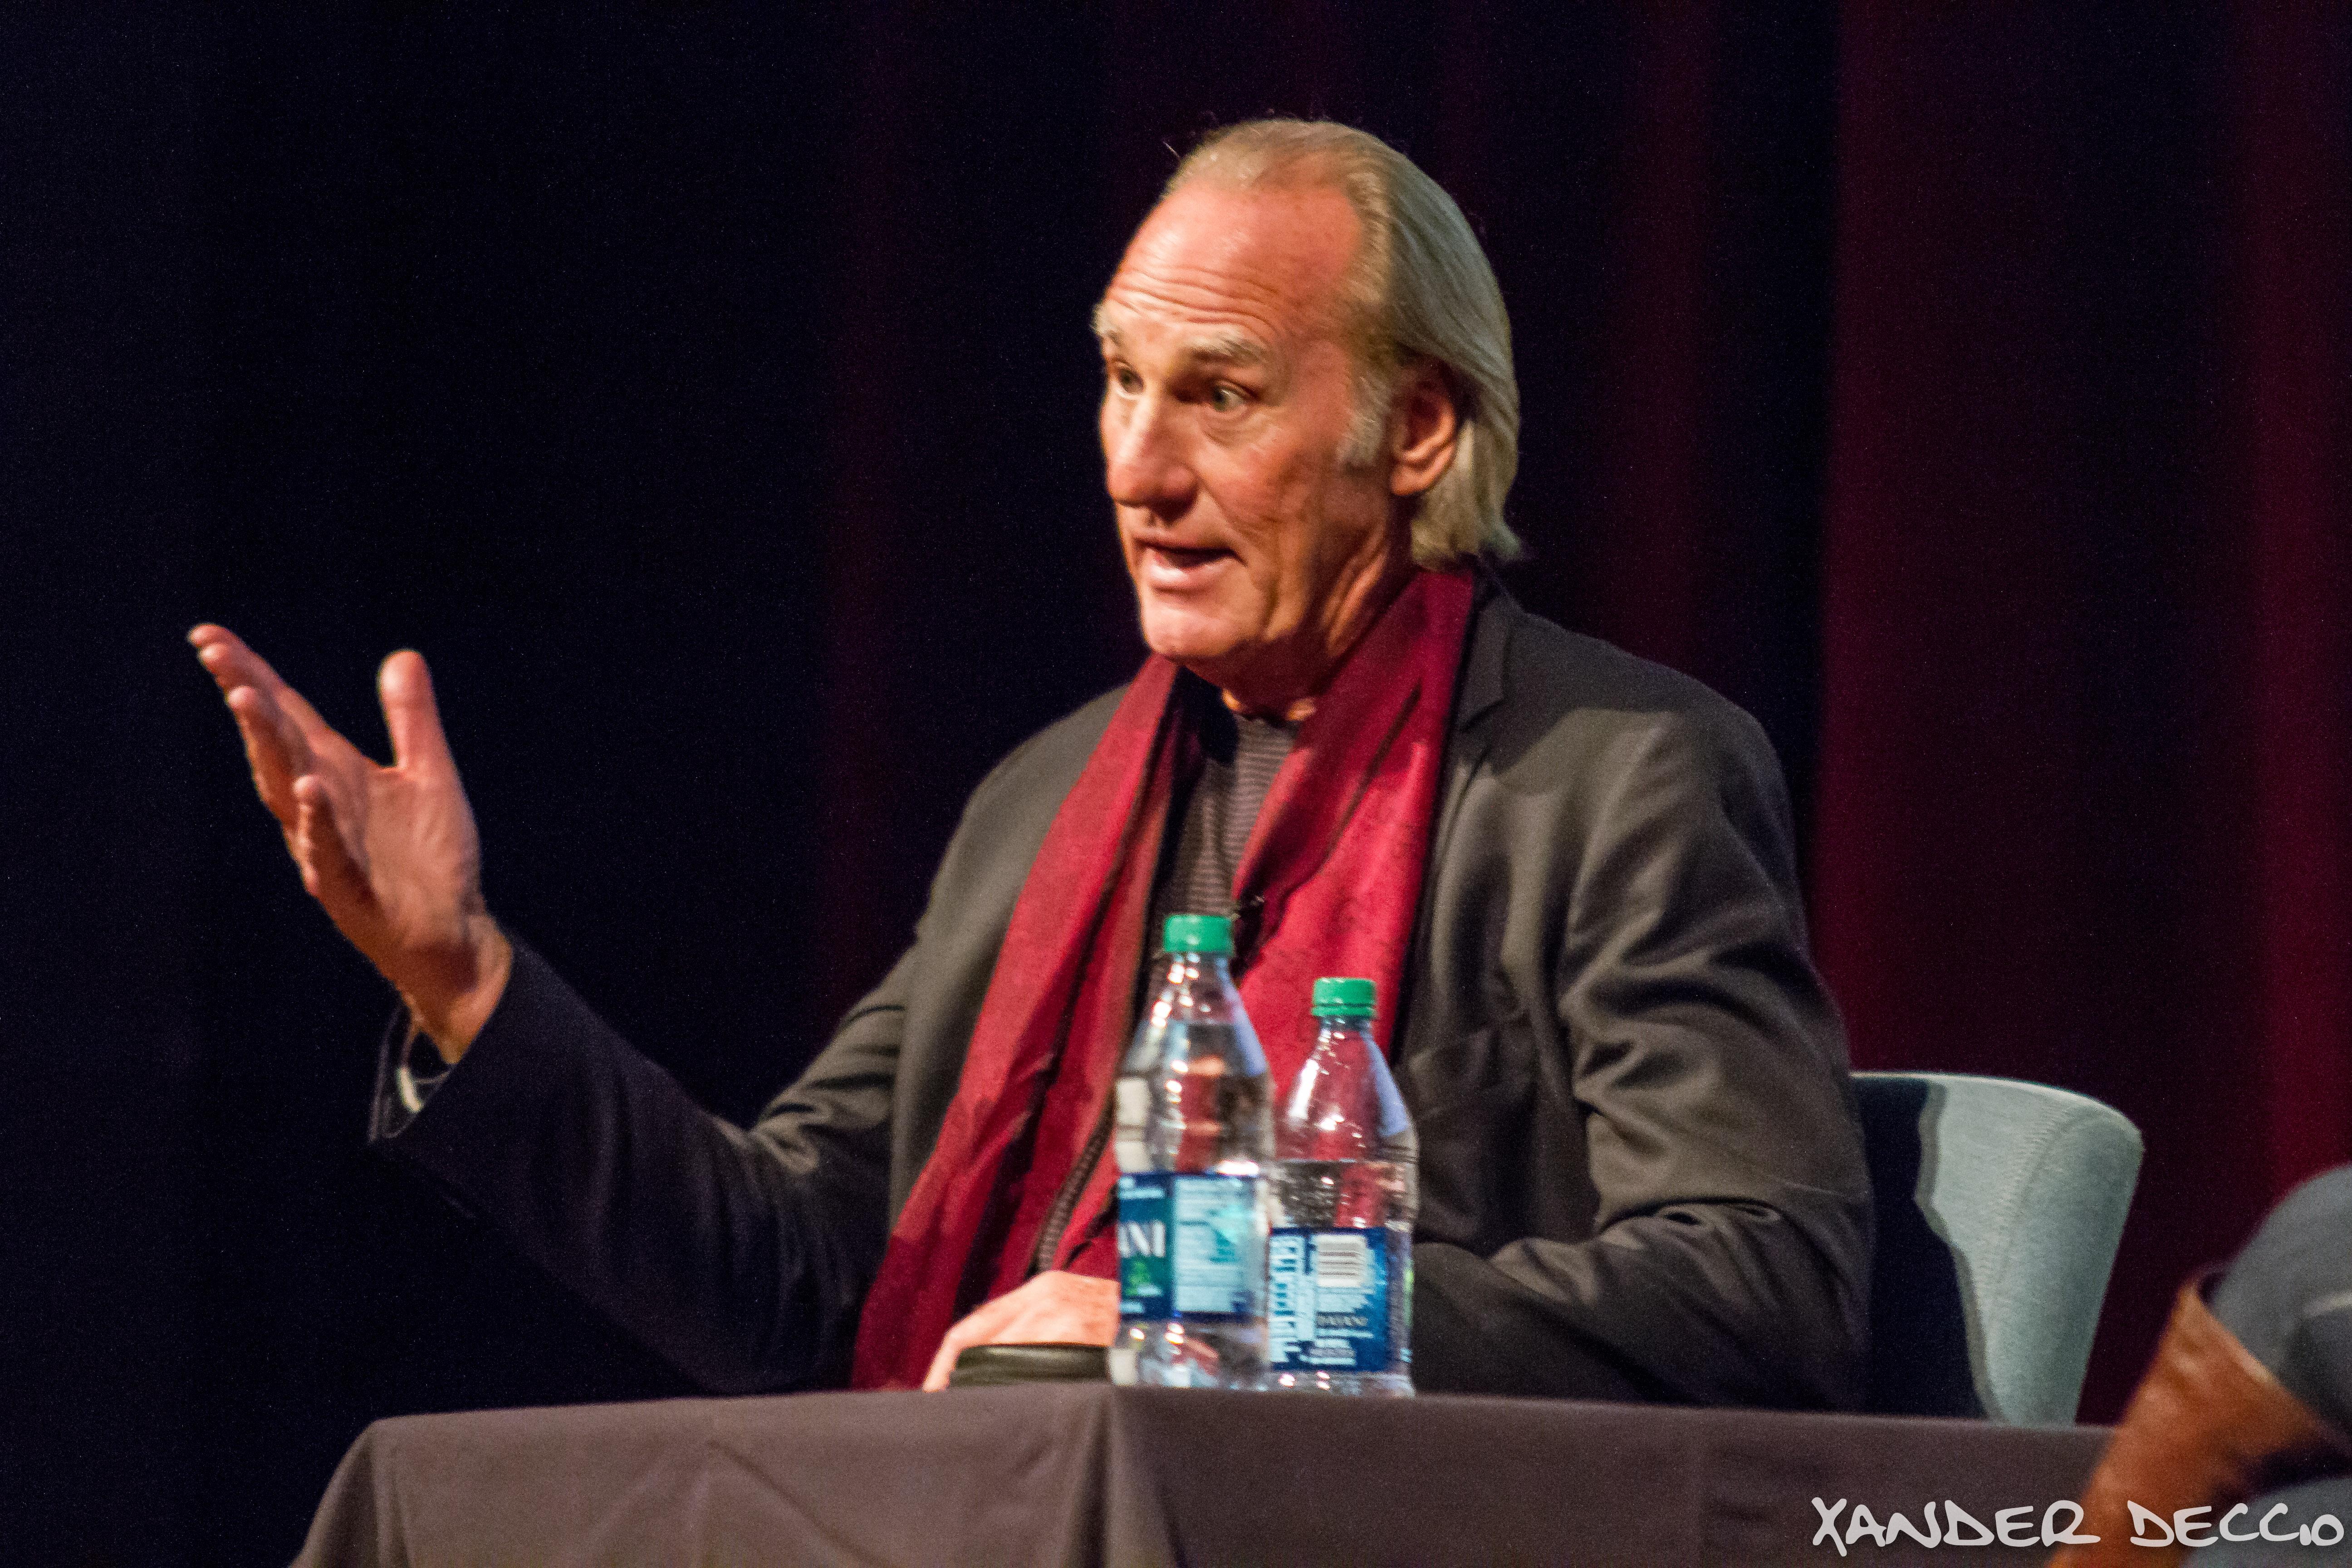 Craig T. Nelson Q&A @ Ellensburg Film Festival 2014 (Photo By: Xander Deccio)